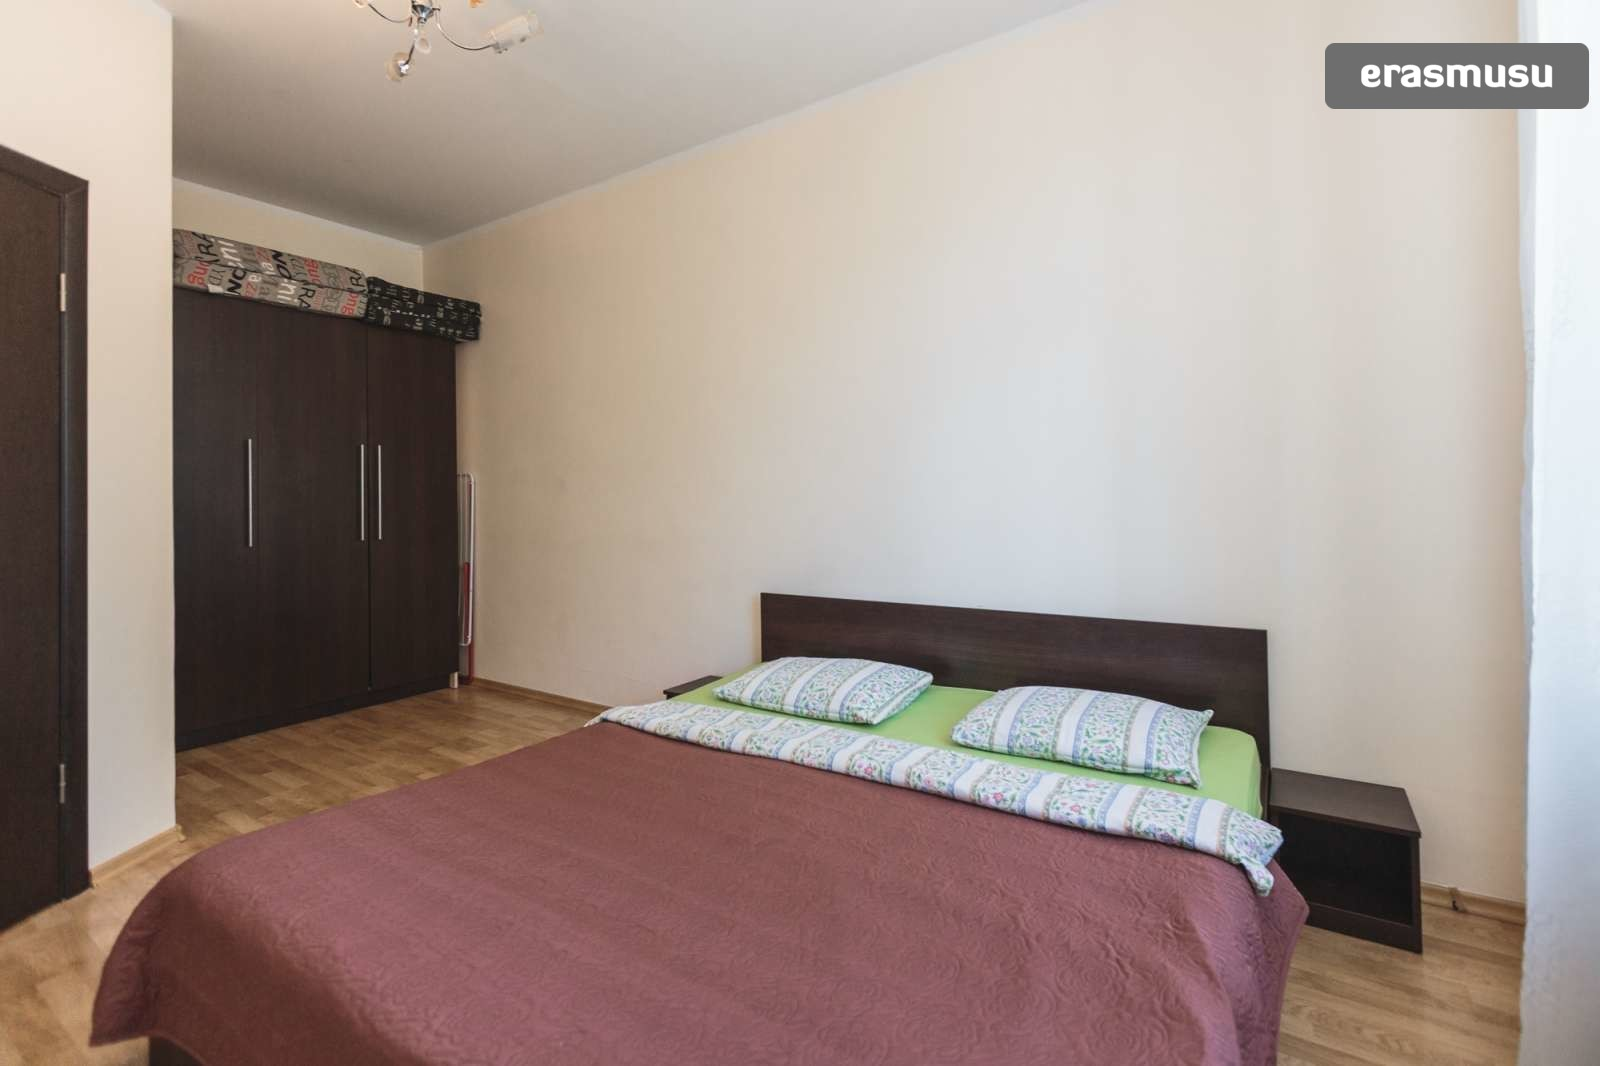 1-bedroom-apartment-rent-maskavas-forstate-c342749c42b95e6744f9c